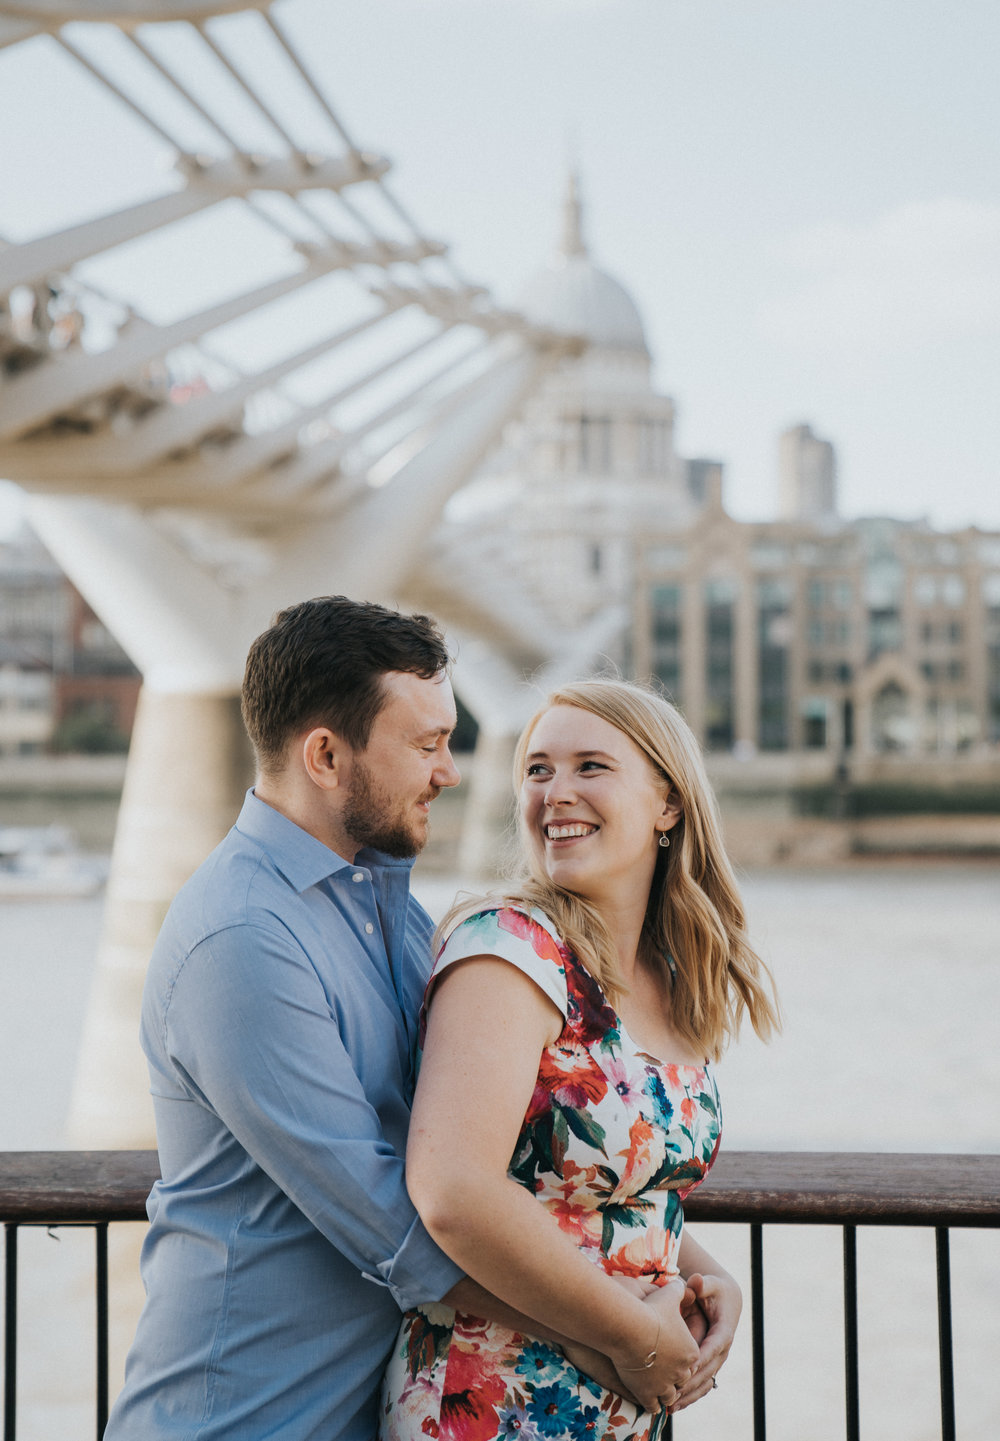 st-paul's-cathedral-millenium-bridge-engagement-wedding-london-photography-videography-02